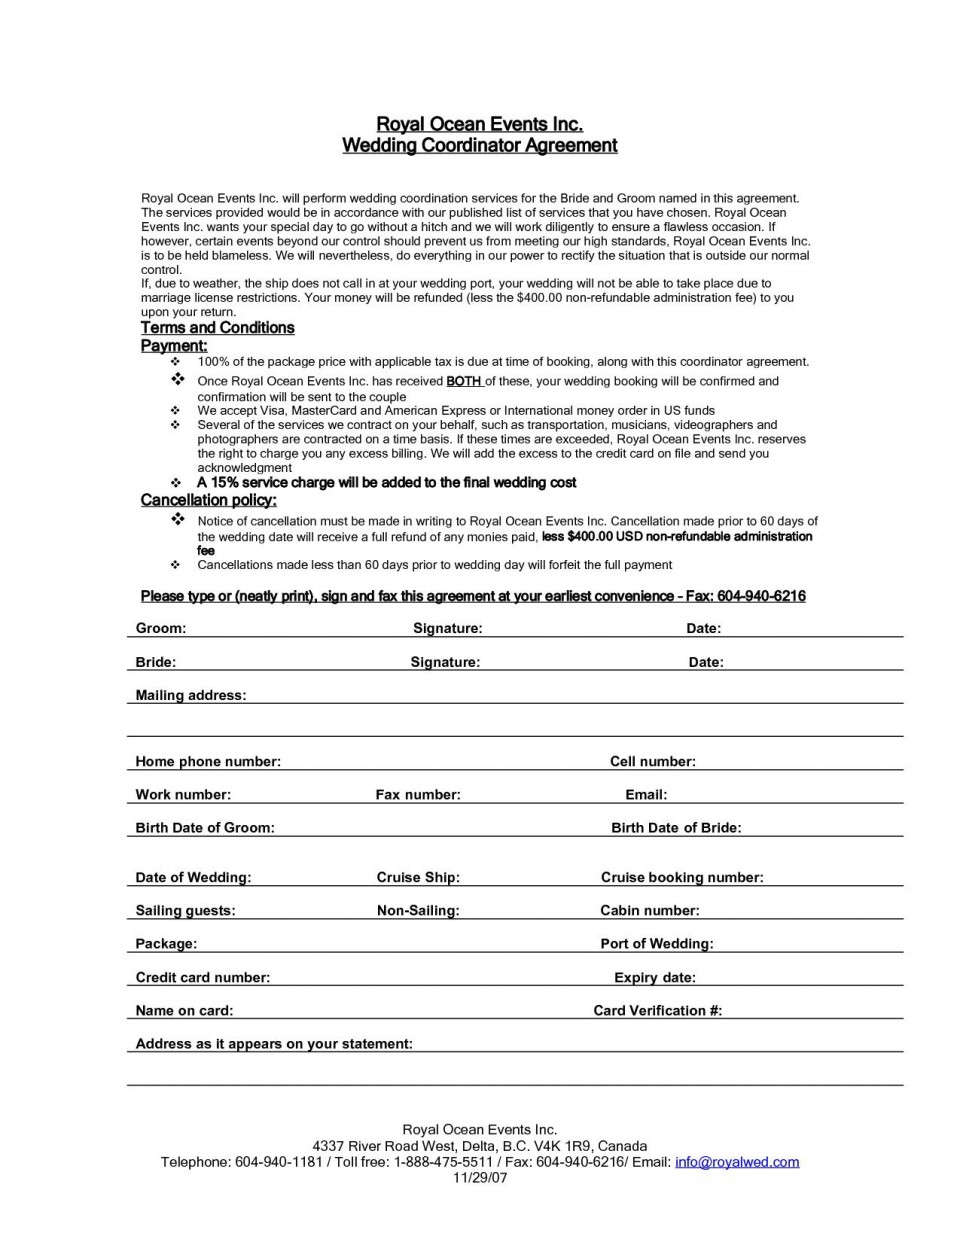 005 Impressive Wedding Planner Contract Template Picture  Uk Australia960